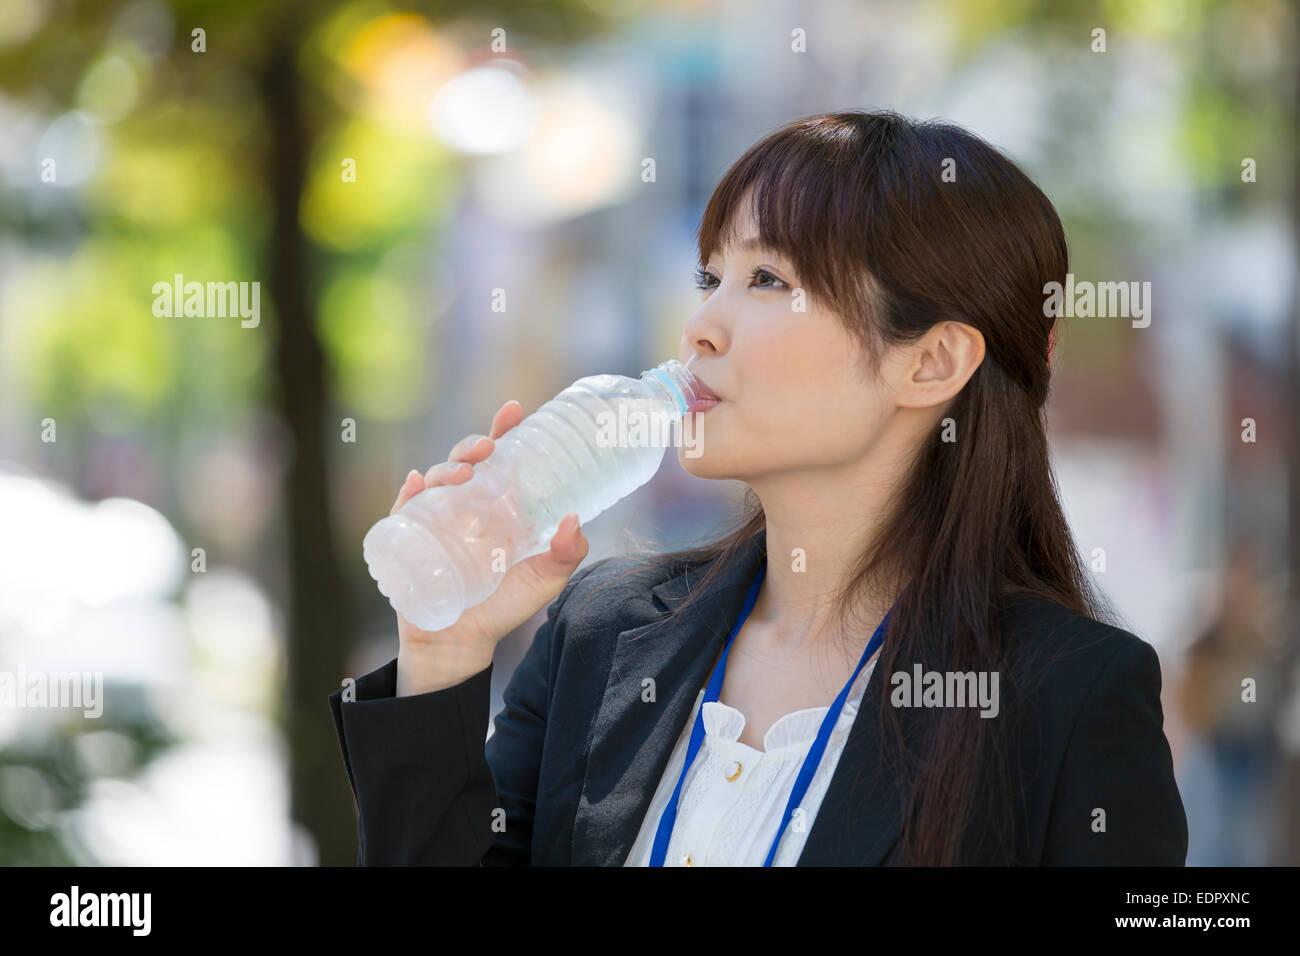 La empresaria beber agua embotellada Imagen De Stock